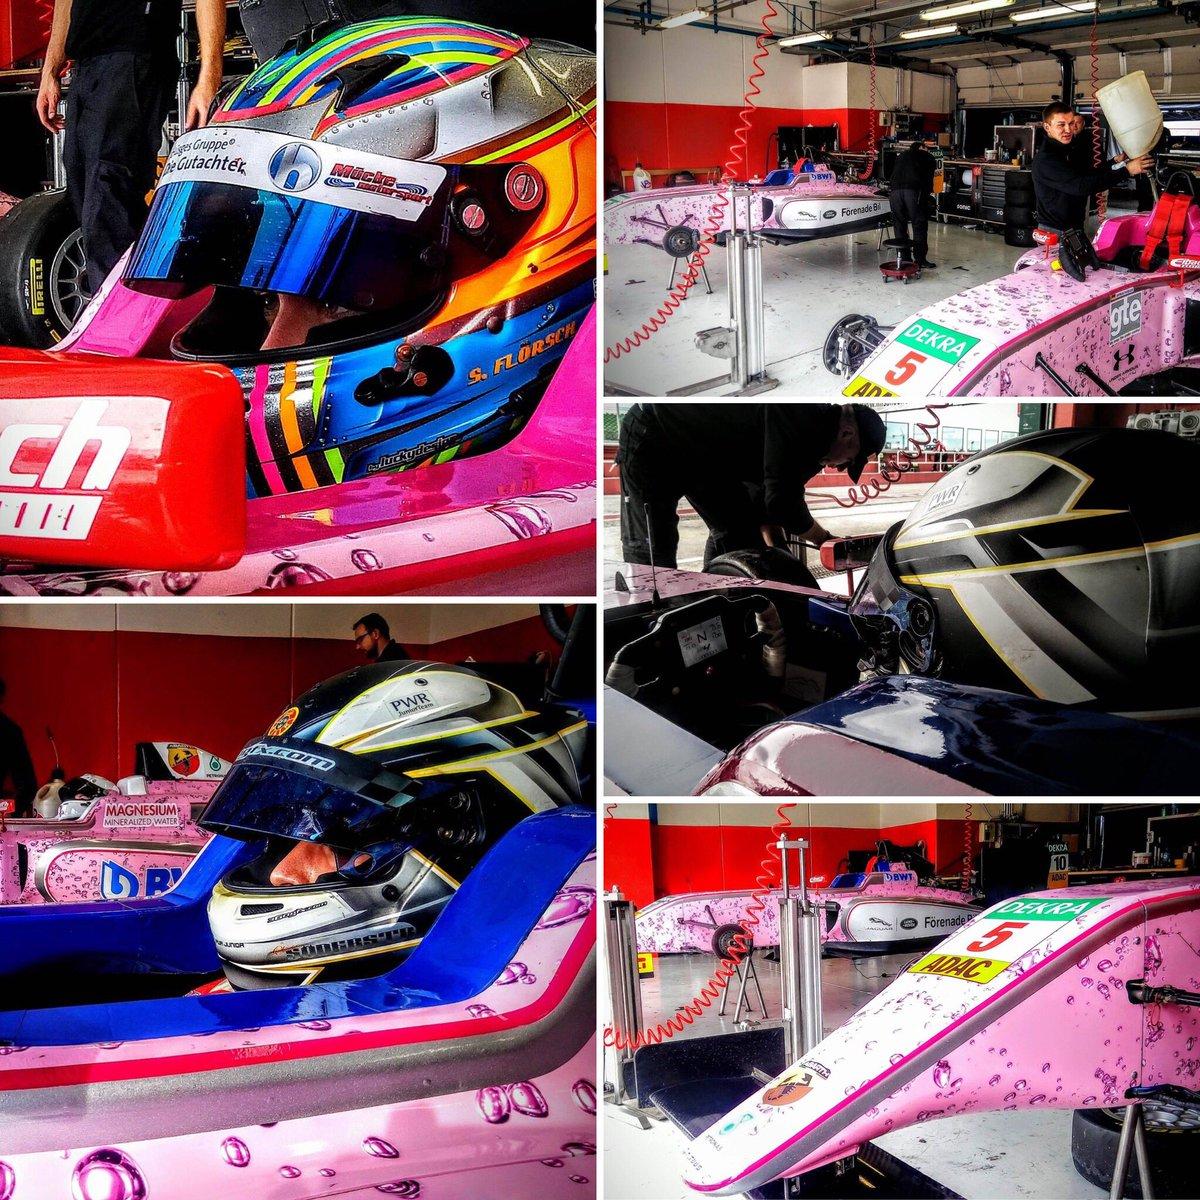 Die Pink Panthers rocken den Misano World Circuit! ✌️🏁 #MückeMotorsport #BWT #ADACFormel4 #PinkPanther https://t.co/vNUMf3s6G3